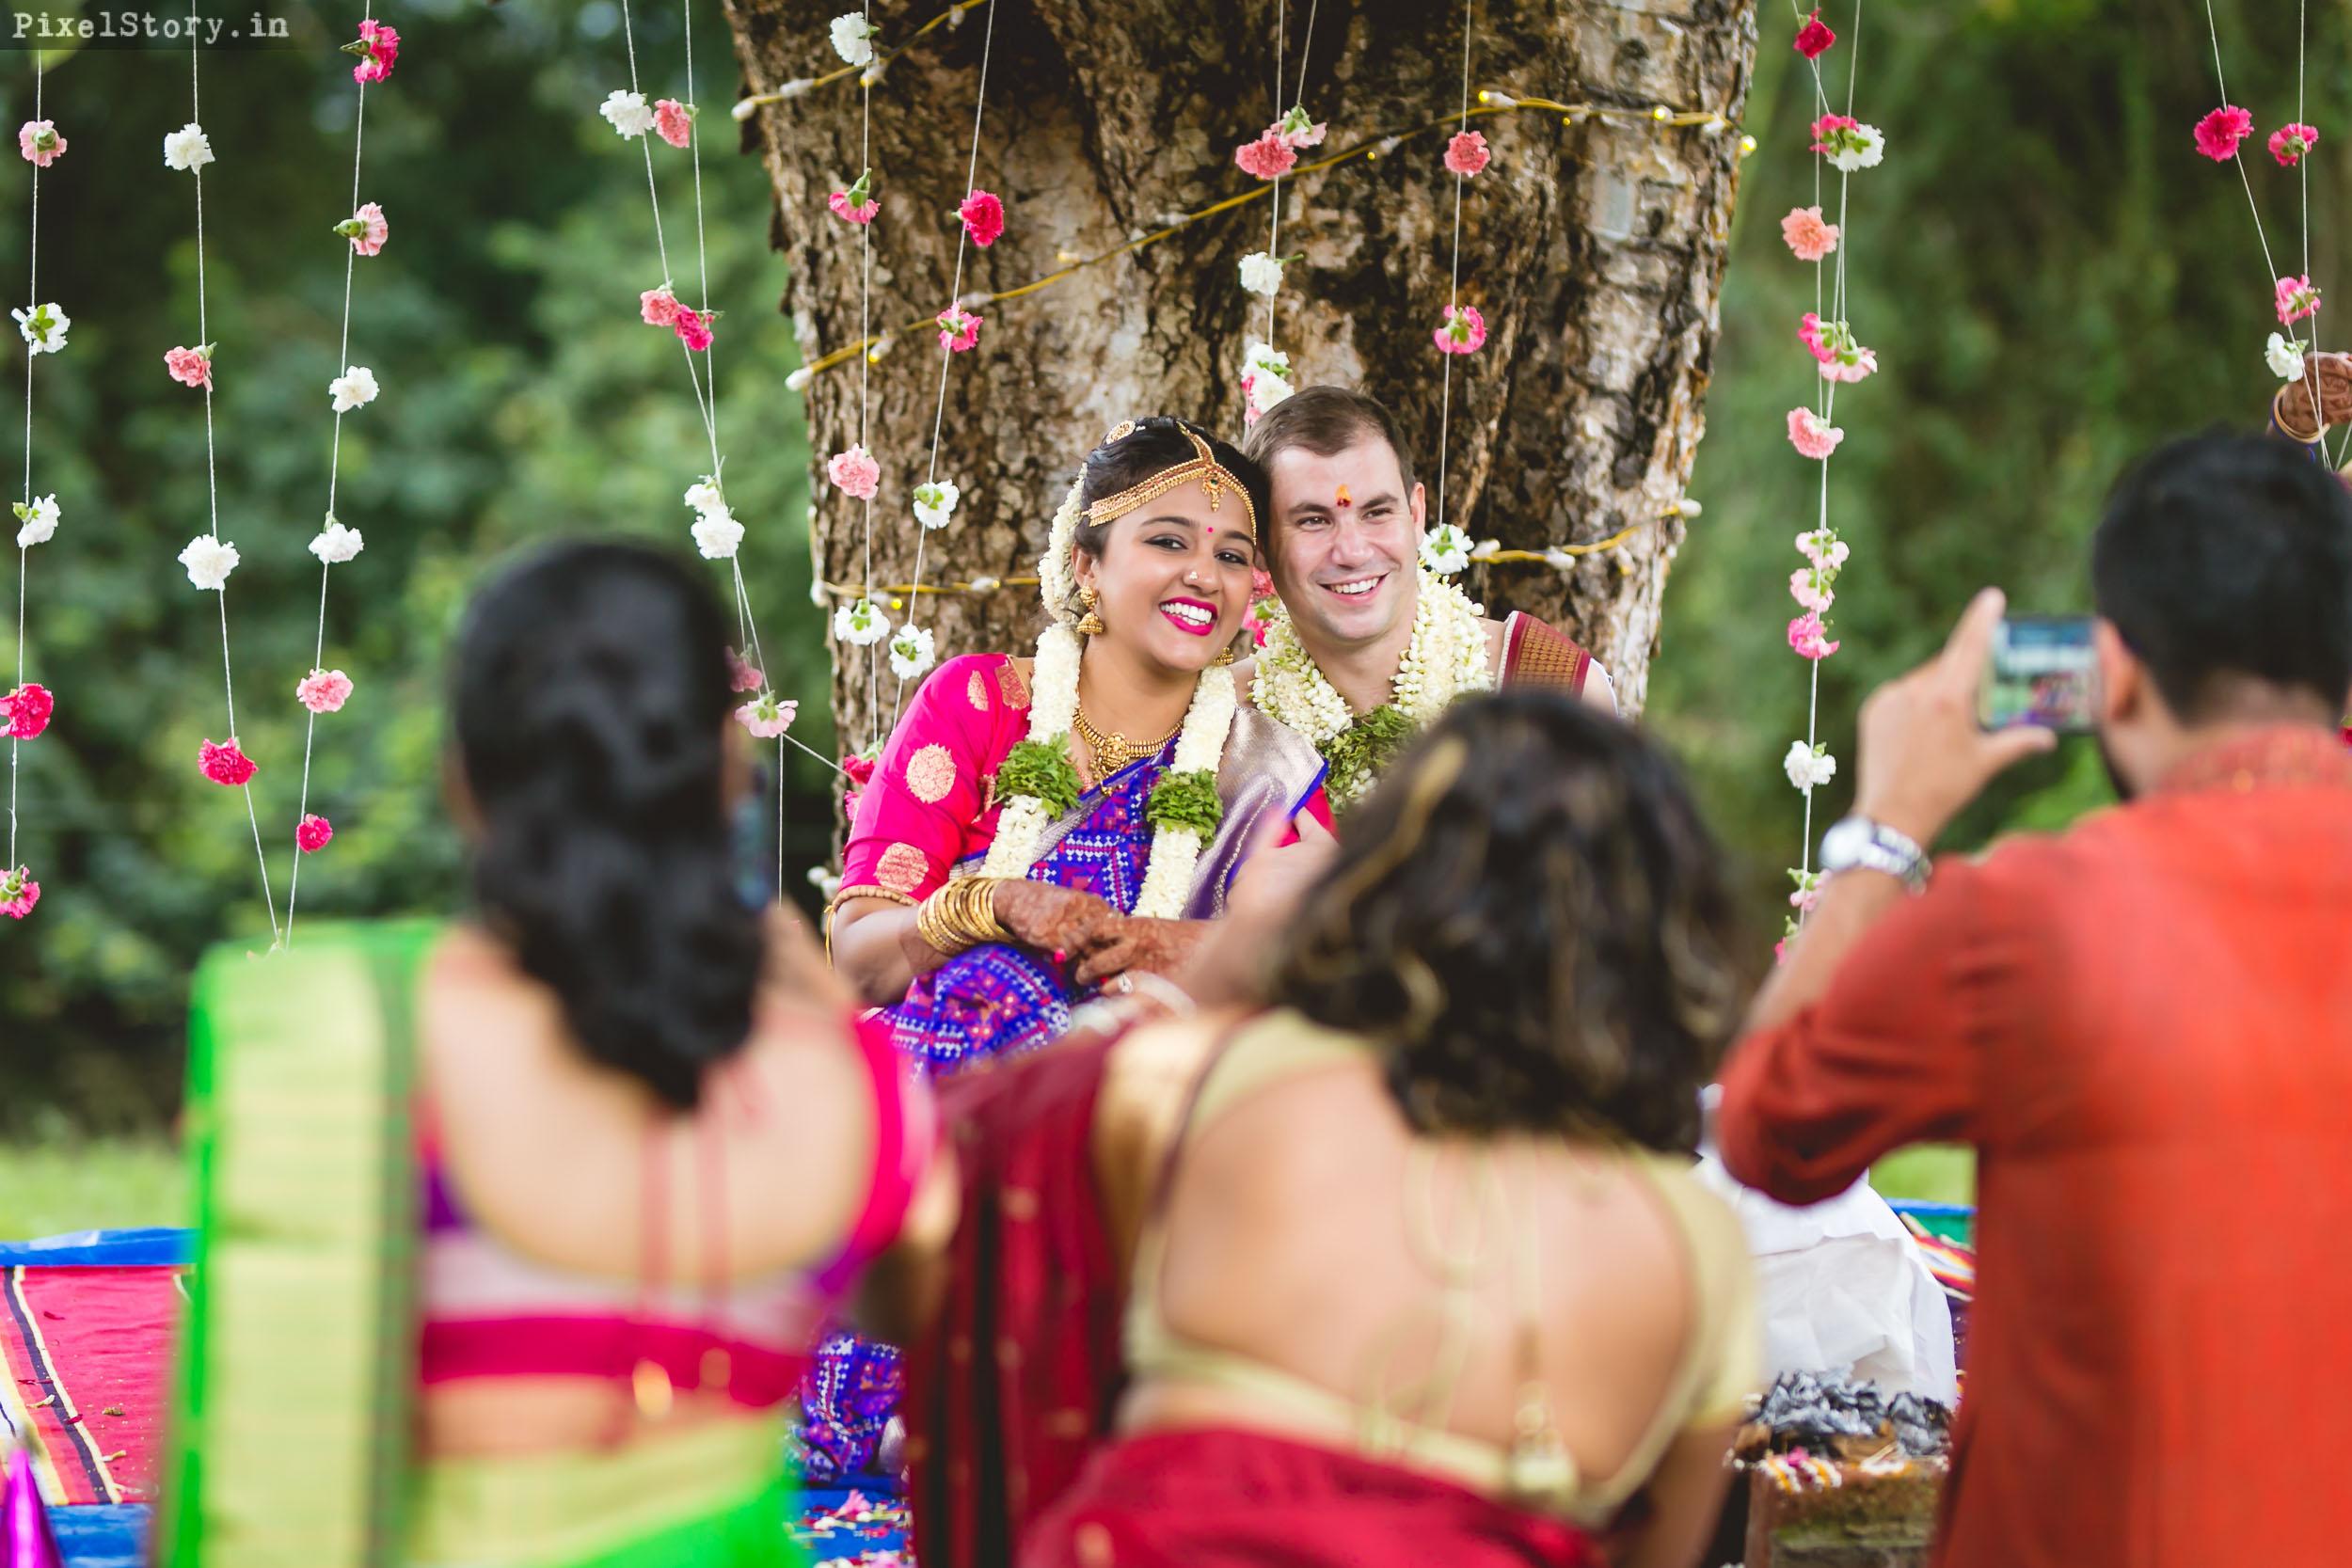 PixelStory-Jungle-Wedding-Photographer-Masinagudi-Indo-French084.jpg